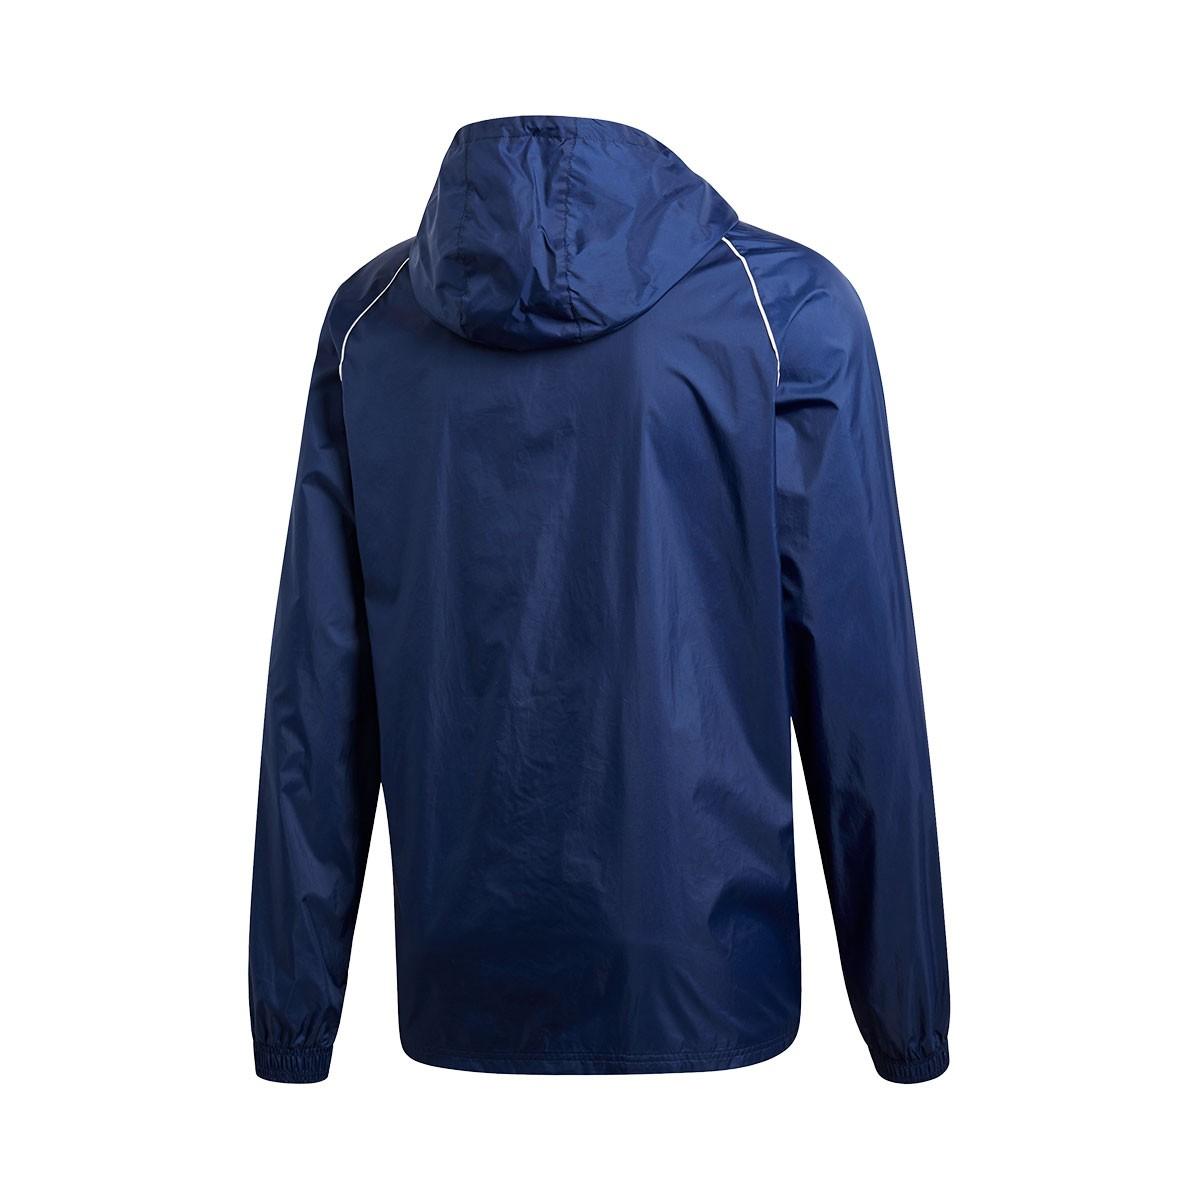 49a42ac54 Chubasquero adidas Core 18 Dark blue-White - Tienda de fútbol Fútbol Emotion